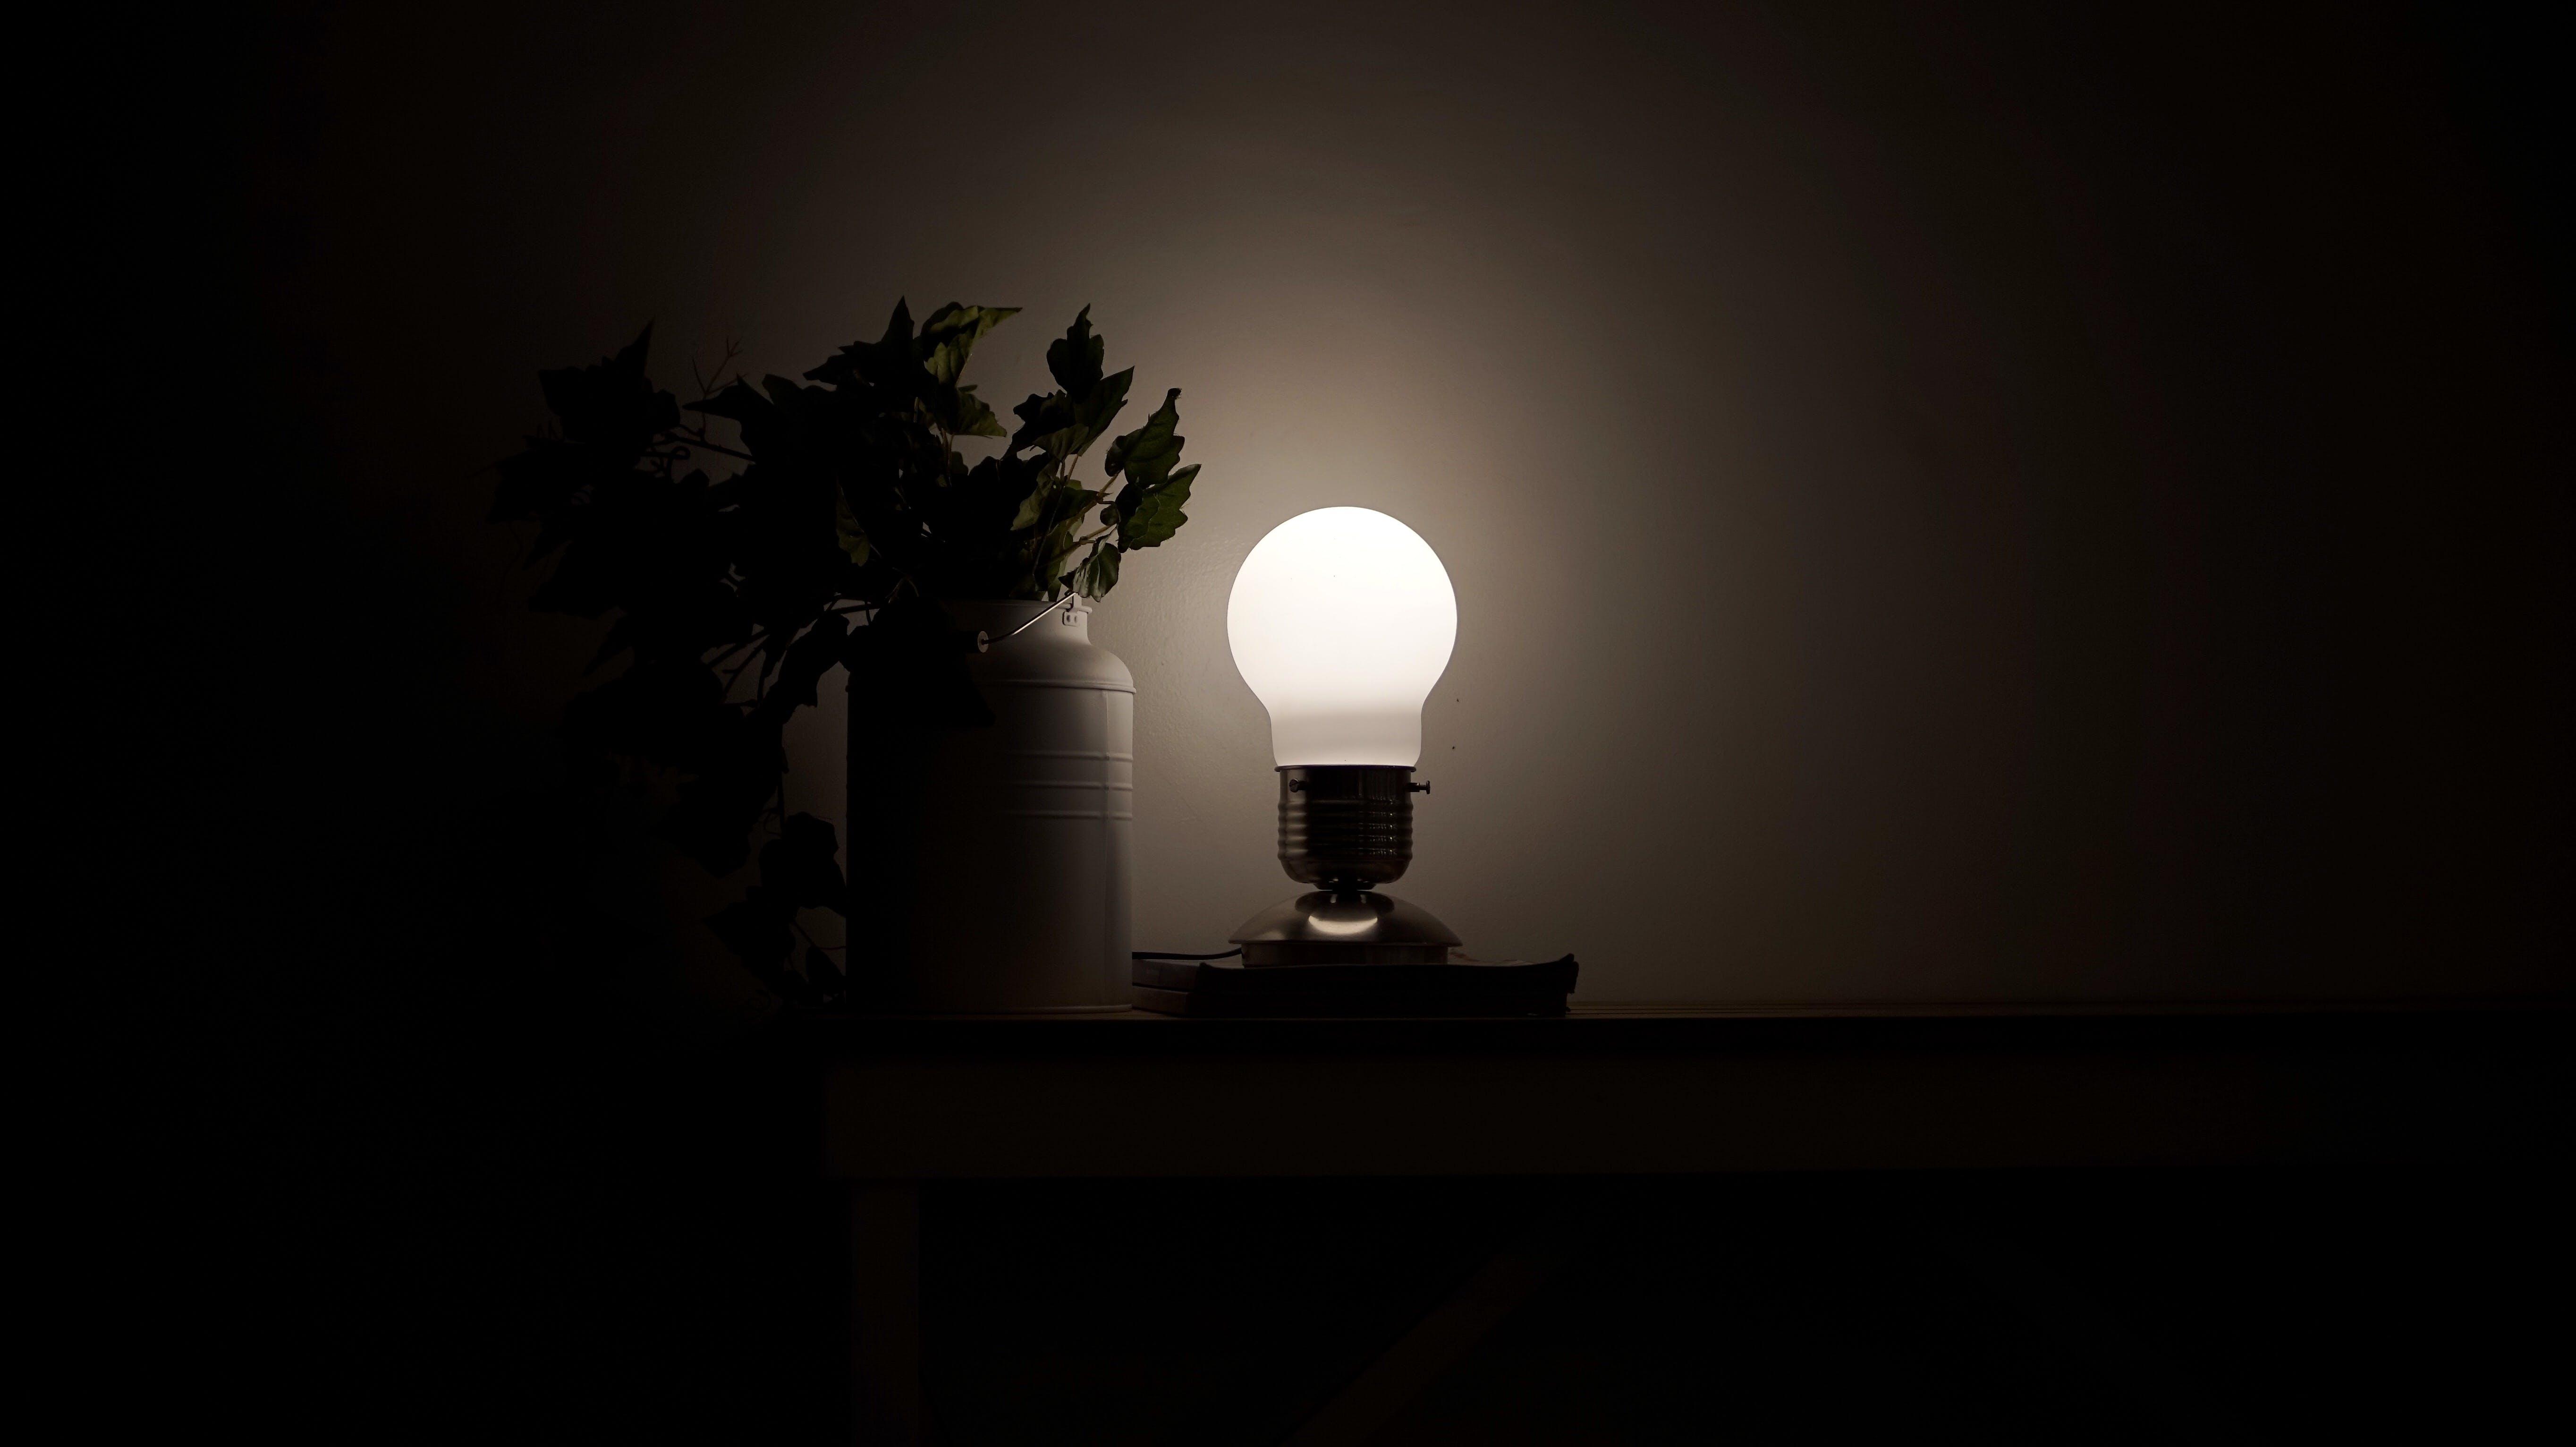 Free stock photo of Bulb lamp, desk lamp, lamp, light bulb